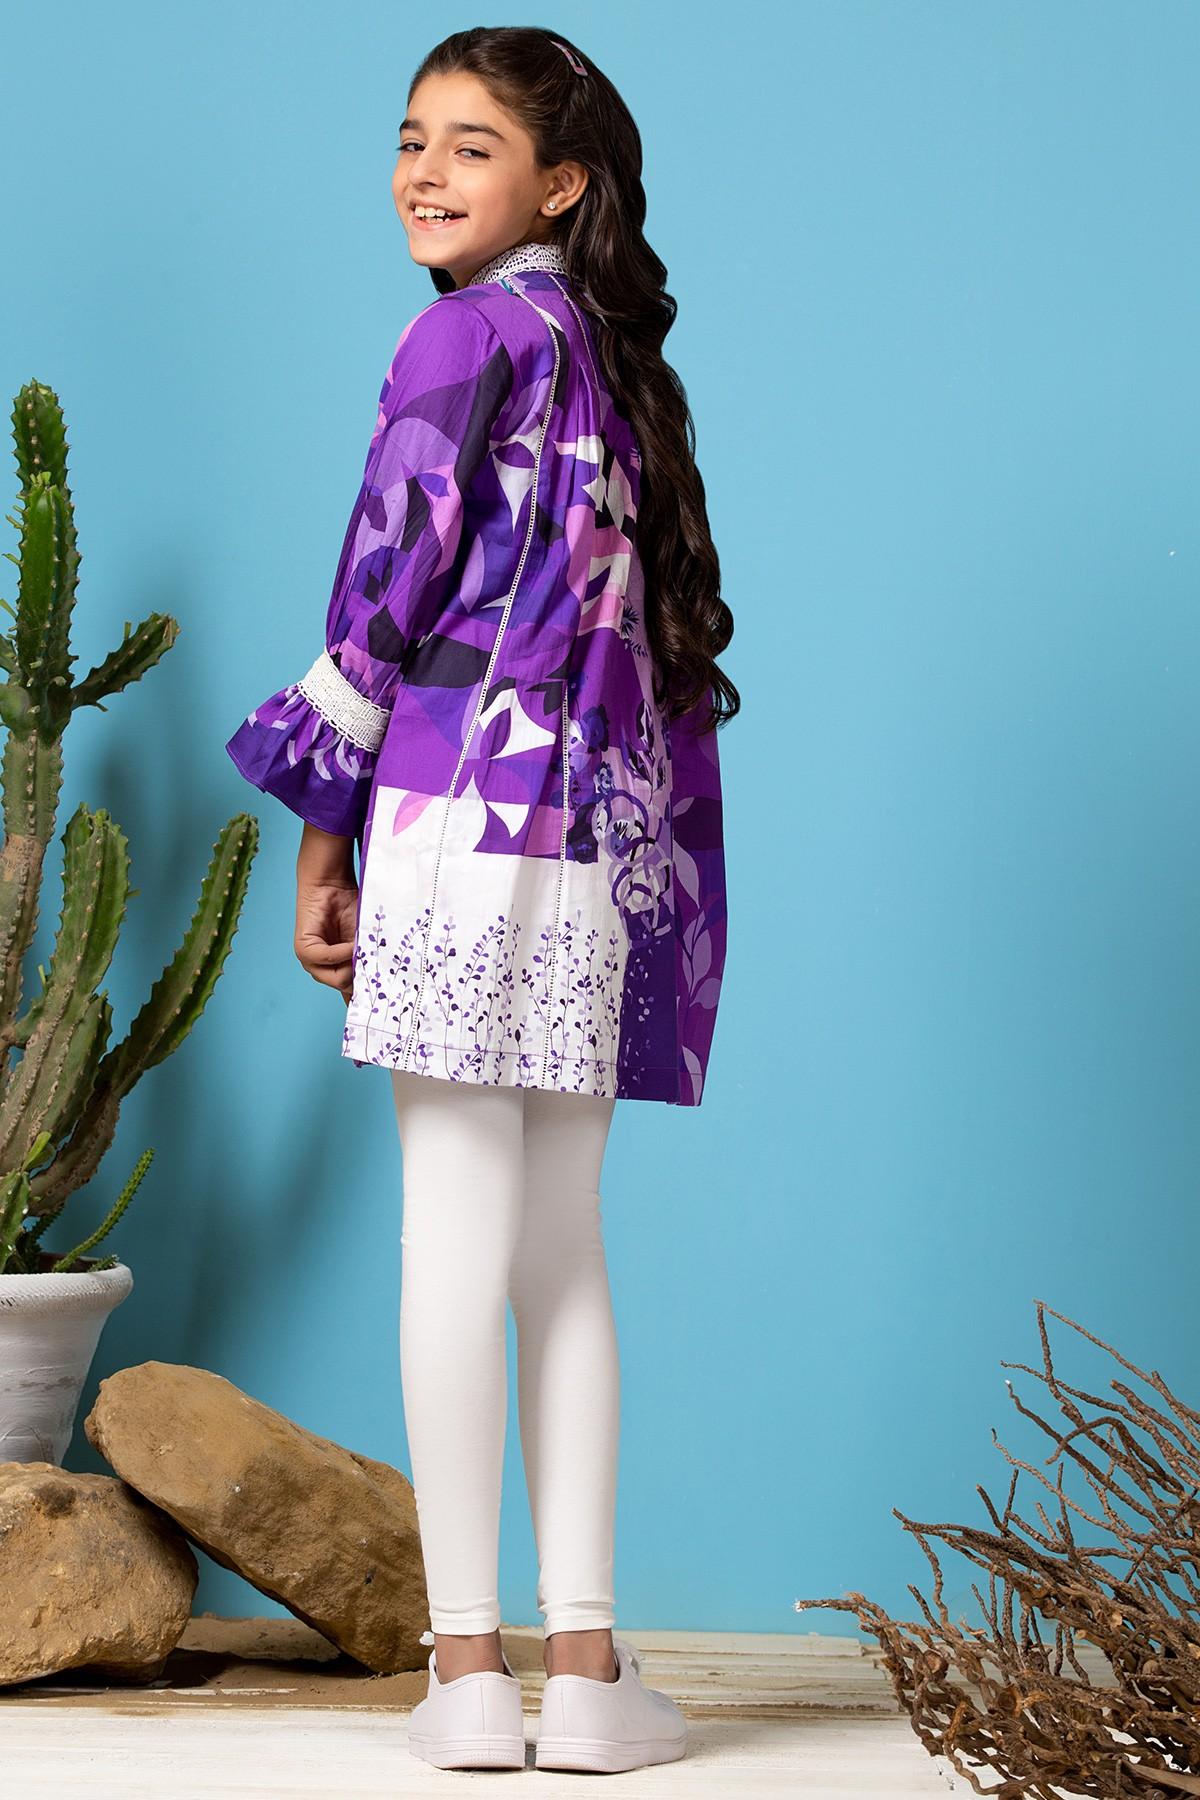 Al-Akram MAK winter collection Purple color Printed Cotton Satin MAK Girl Kurti